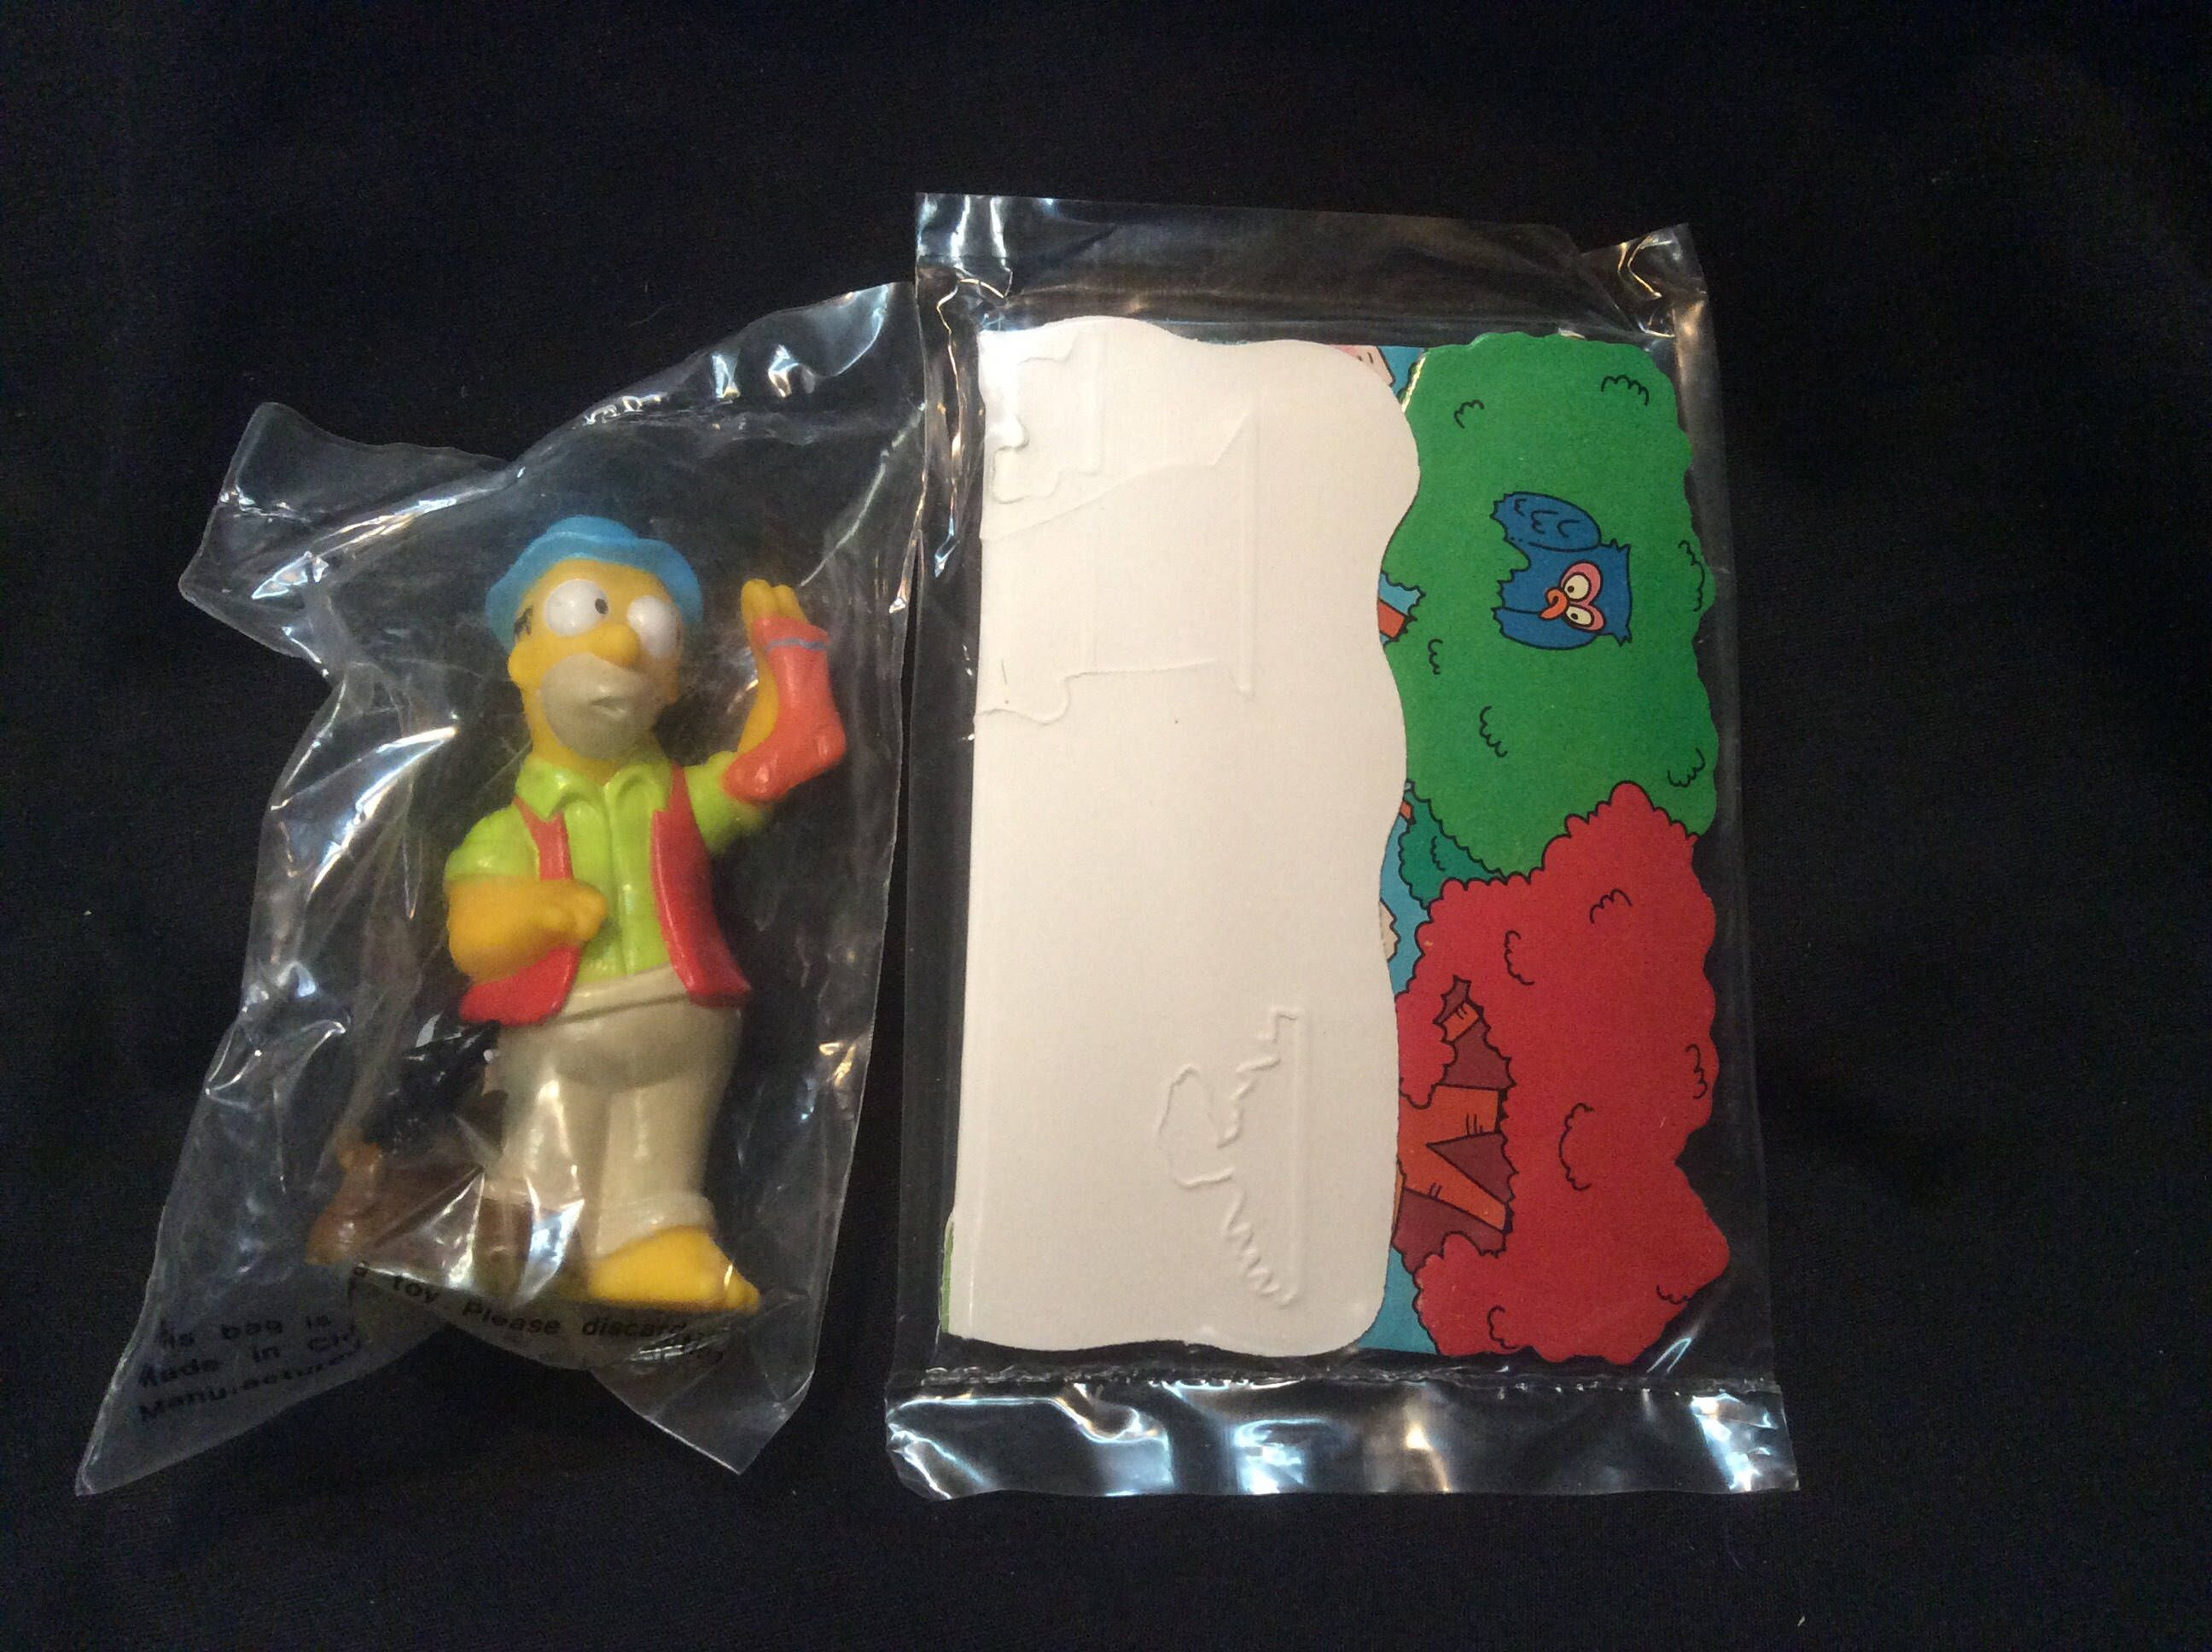 1990 Burger King Simpsons Camping series figures Marge sealed in baggie